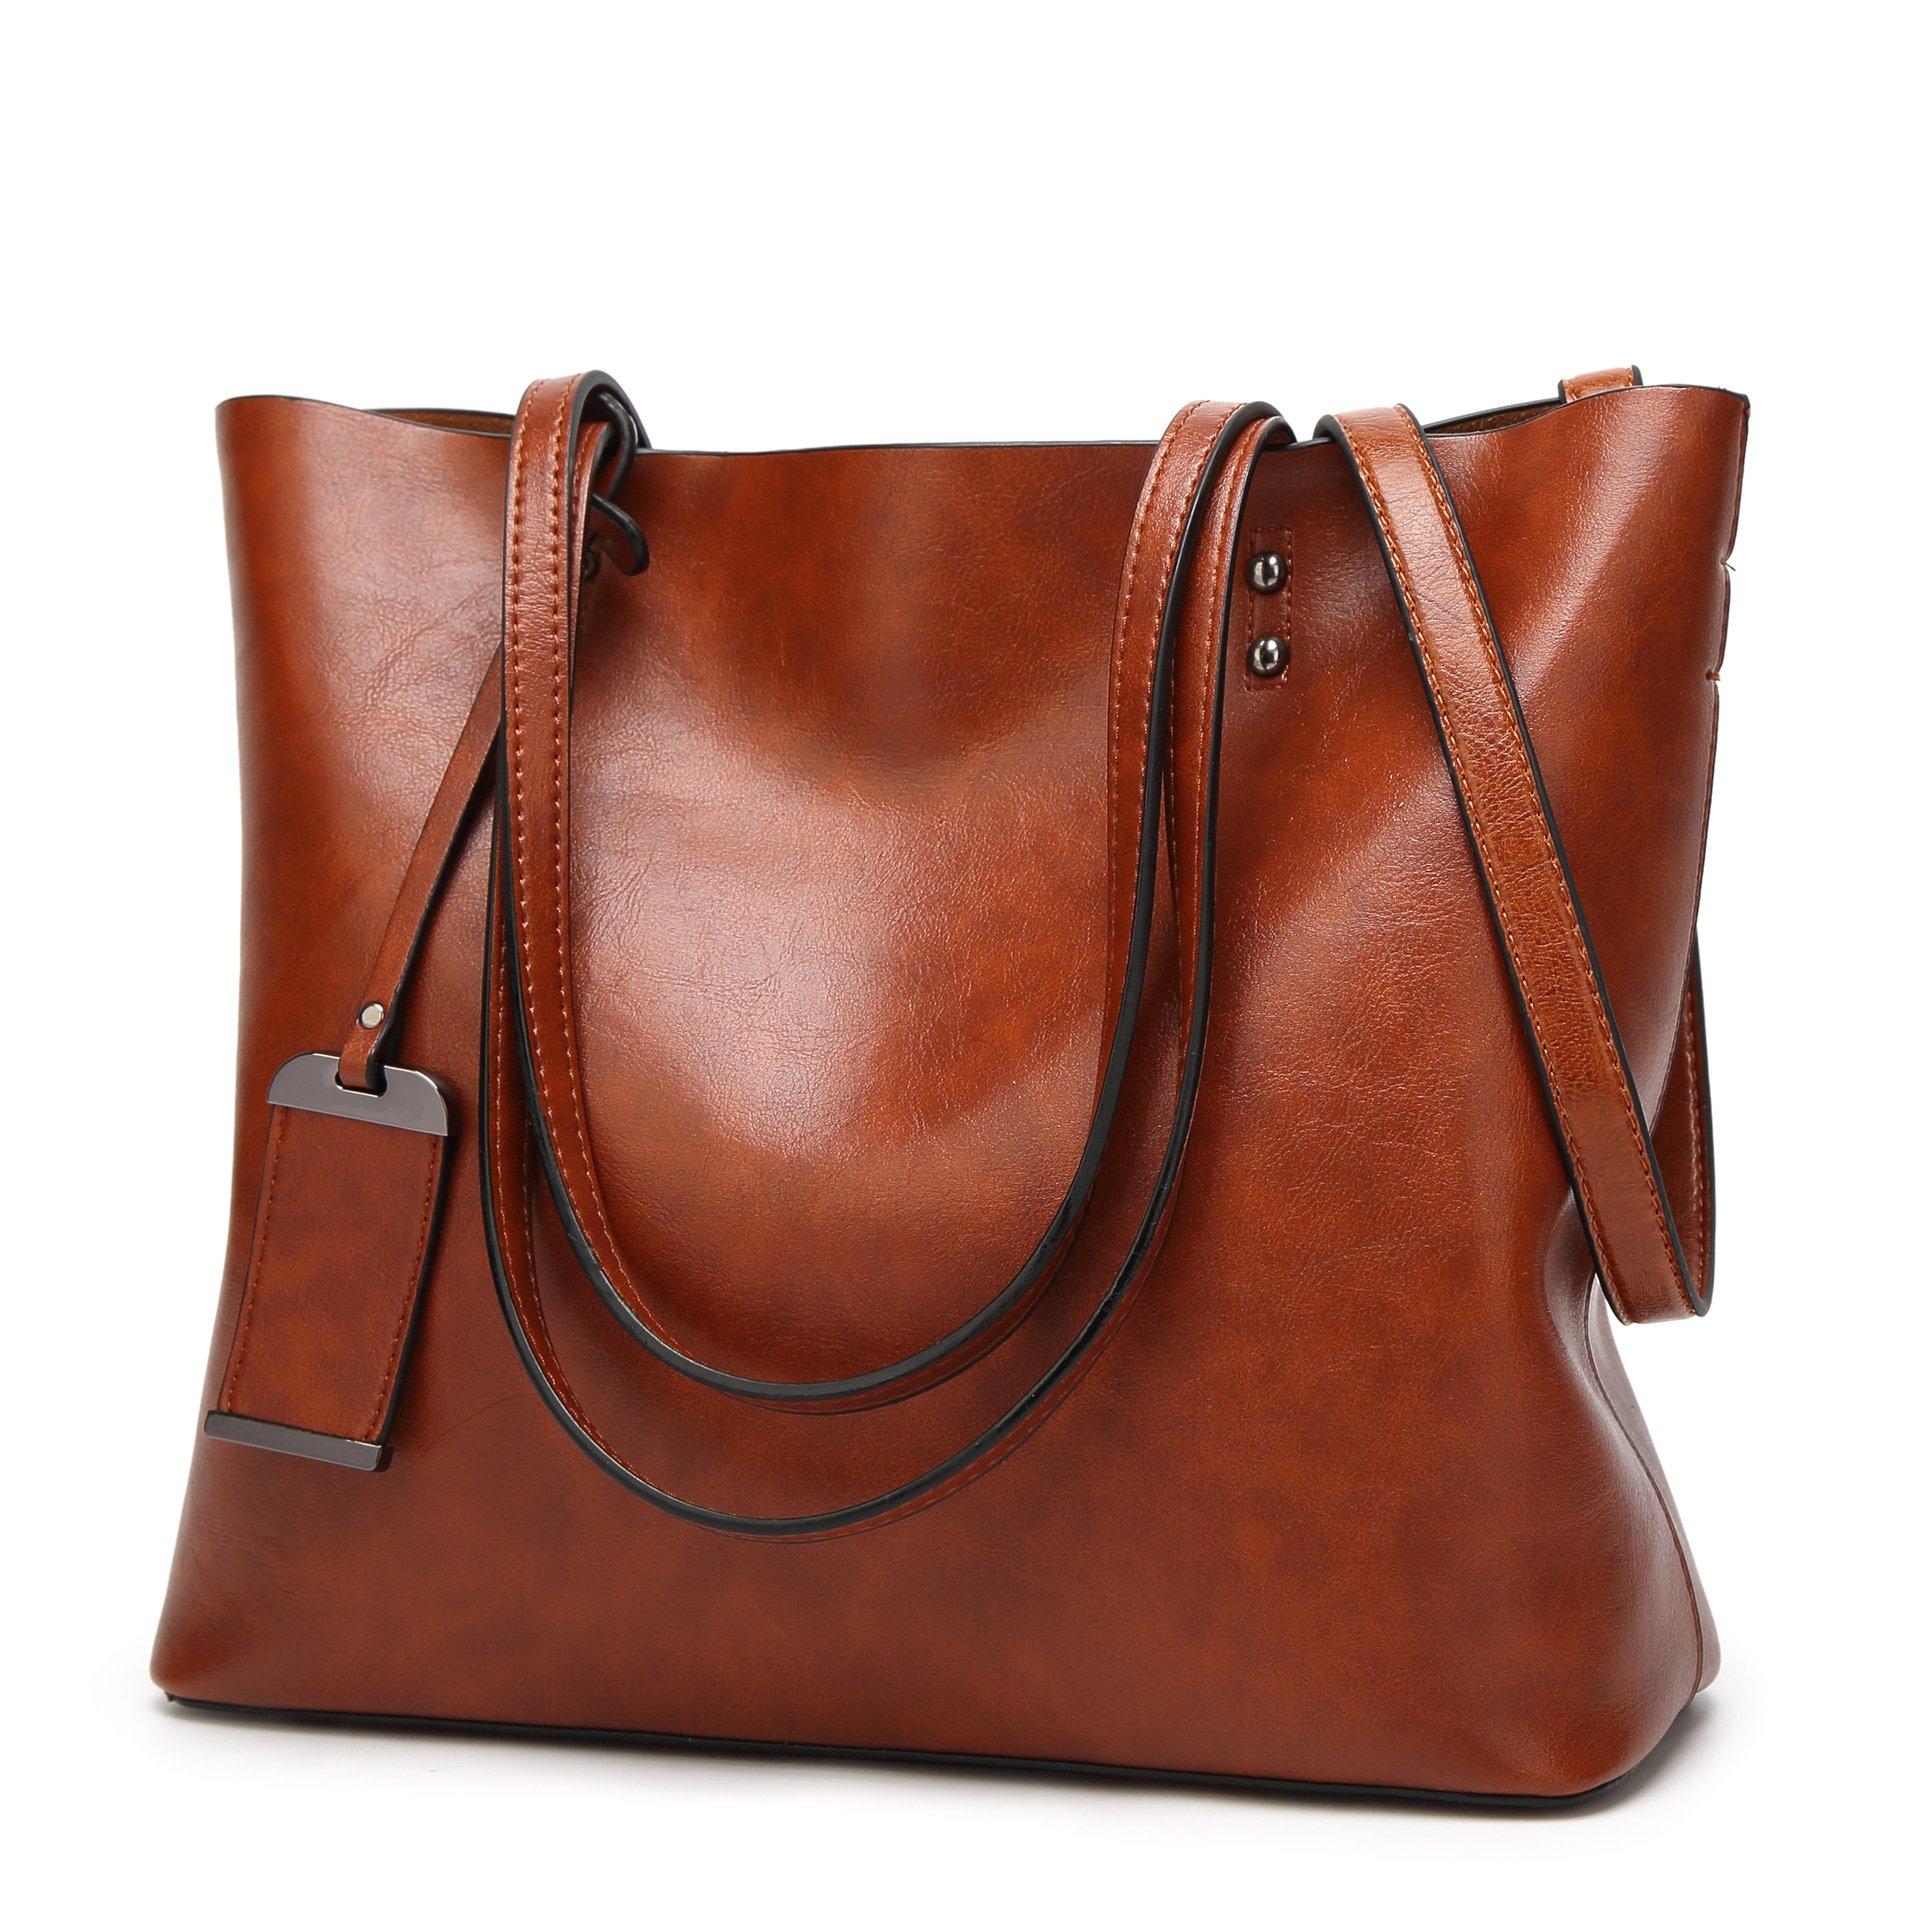 CIR Women's Vintage Fine Fibre Genuine Leather Bag Tote Shoulder Bag Handbag Model Zoe Brown